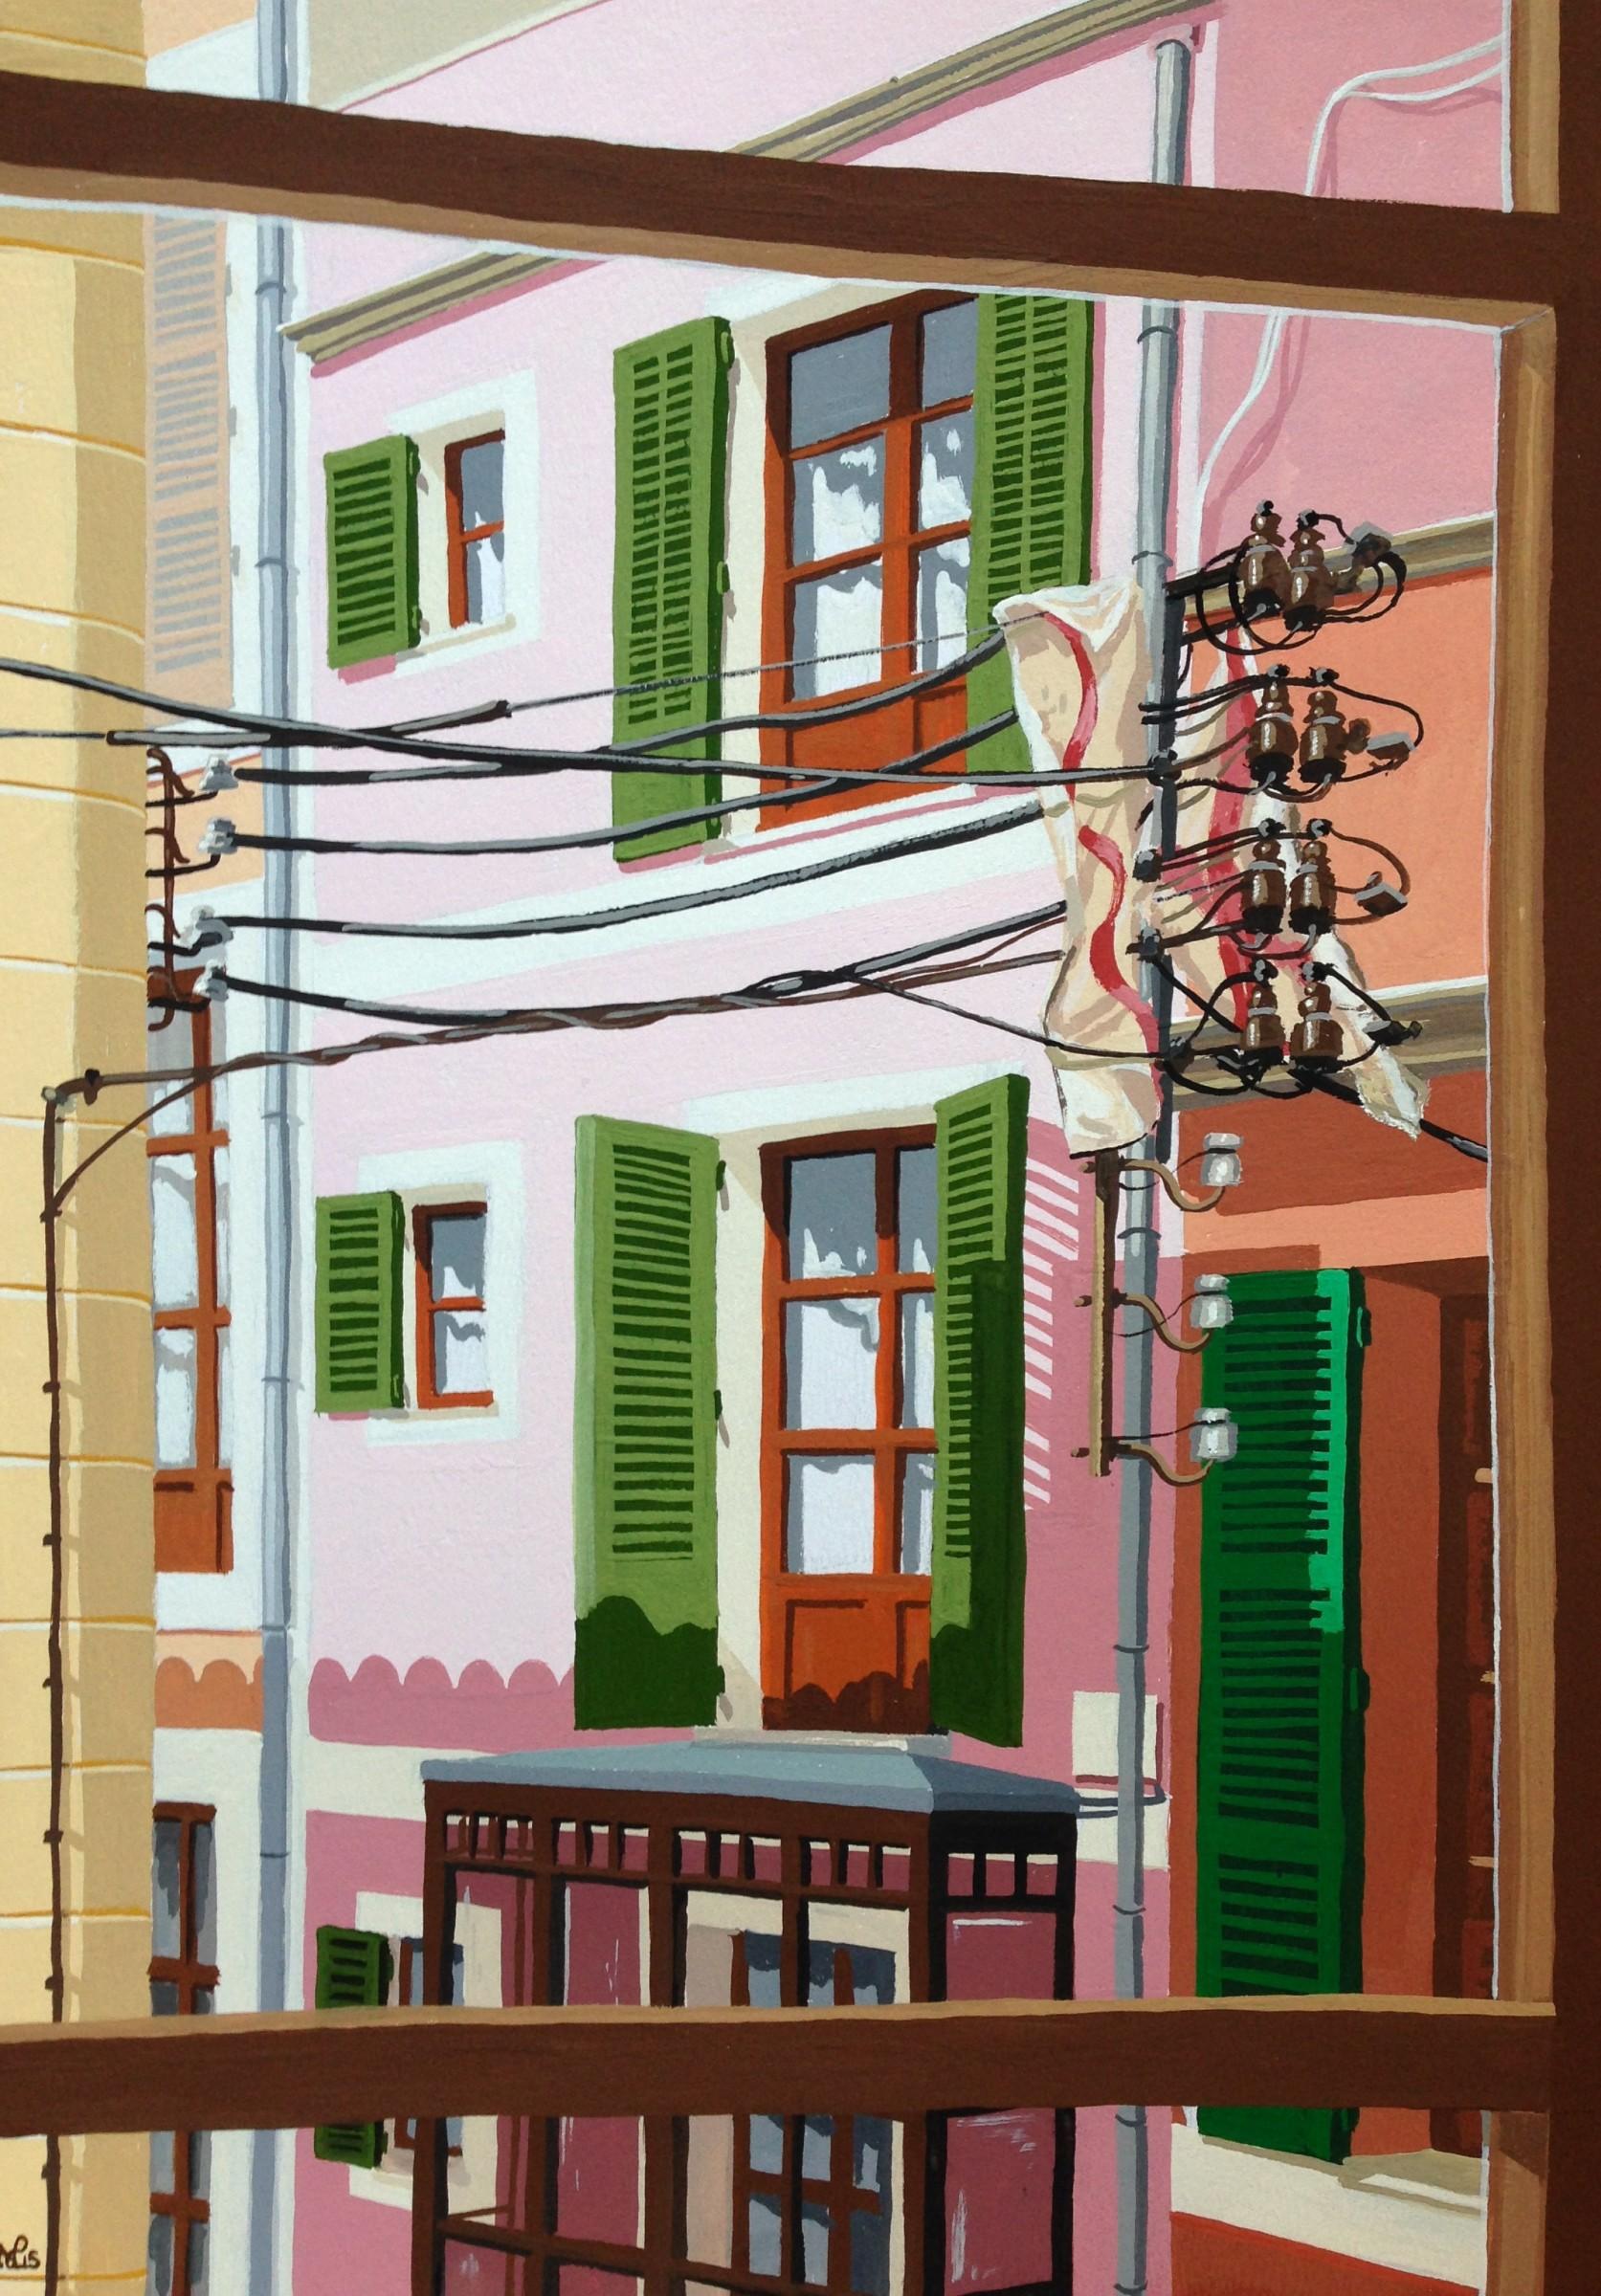 <span class=&#34;link fancybox-details-link&#34;><a href=&#34;/exhibitions/16/works/image_standalone388/&#34;>View Detail Page</a></span><p>Nicholas De Lacy-Brown,&#160;<em>Ocho Balcones (2): Old Town Cables, Palma,&#160;</em>&#163;750</p>